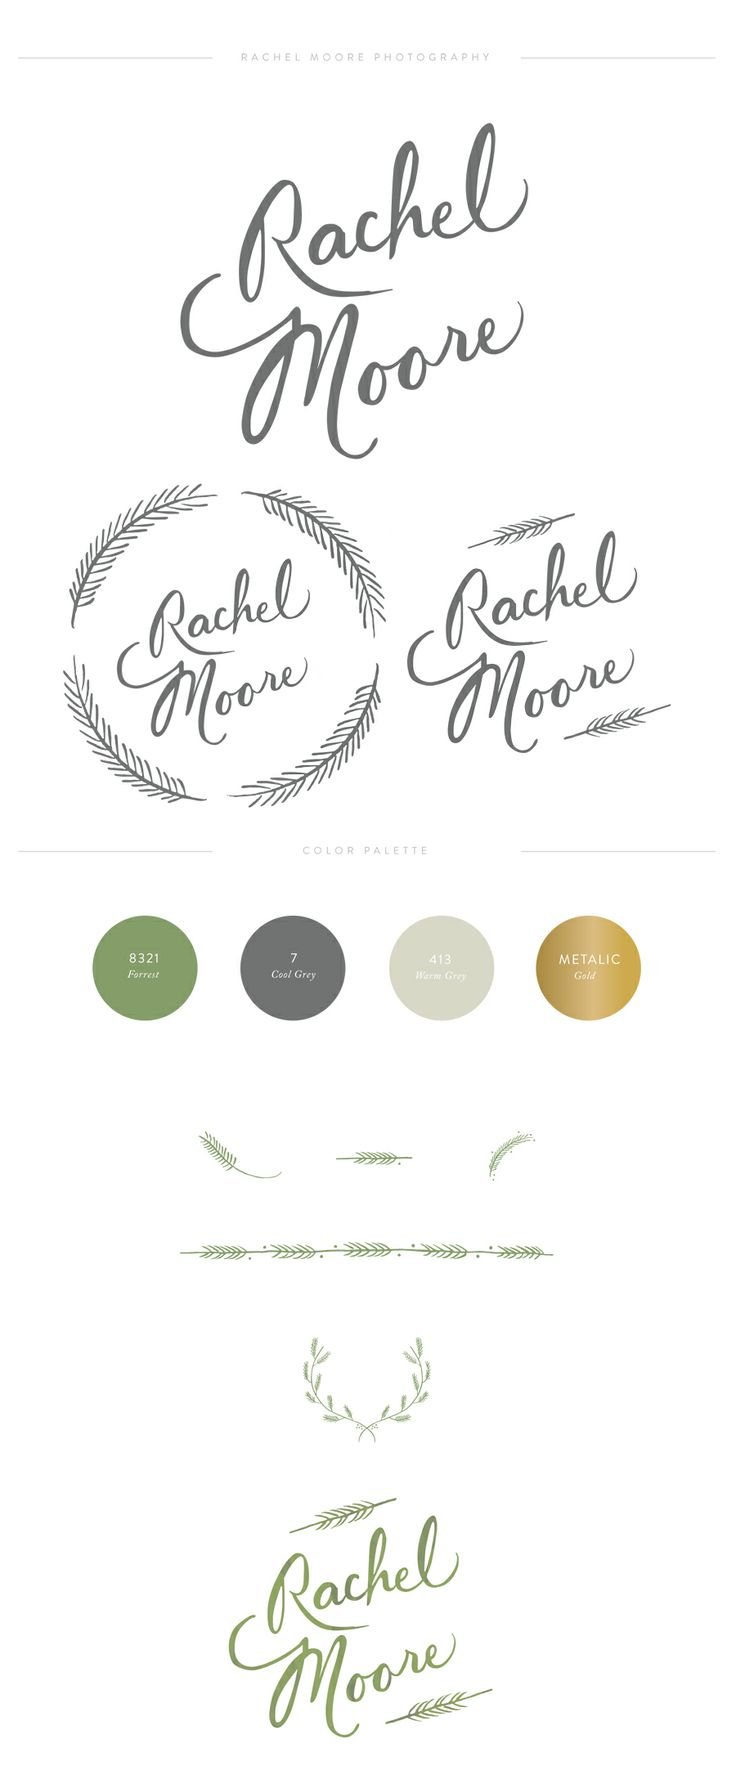 {Rachel Moore} JUN 28, 2013 – New Branding → http://rachelmoorephoto.com/new-branding